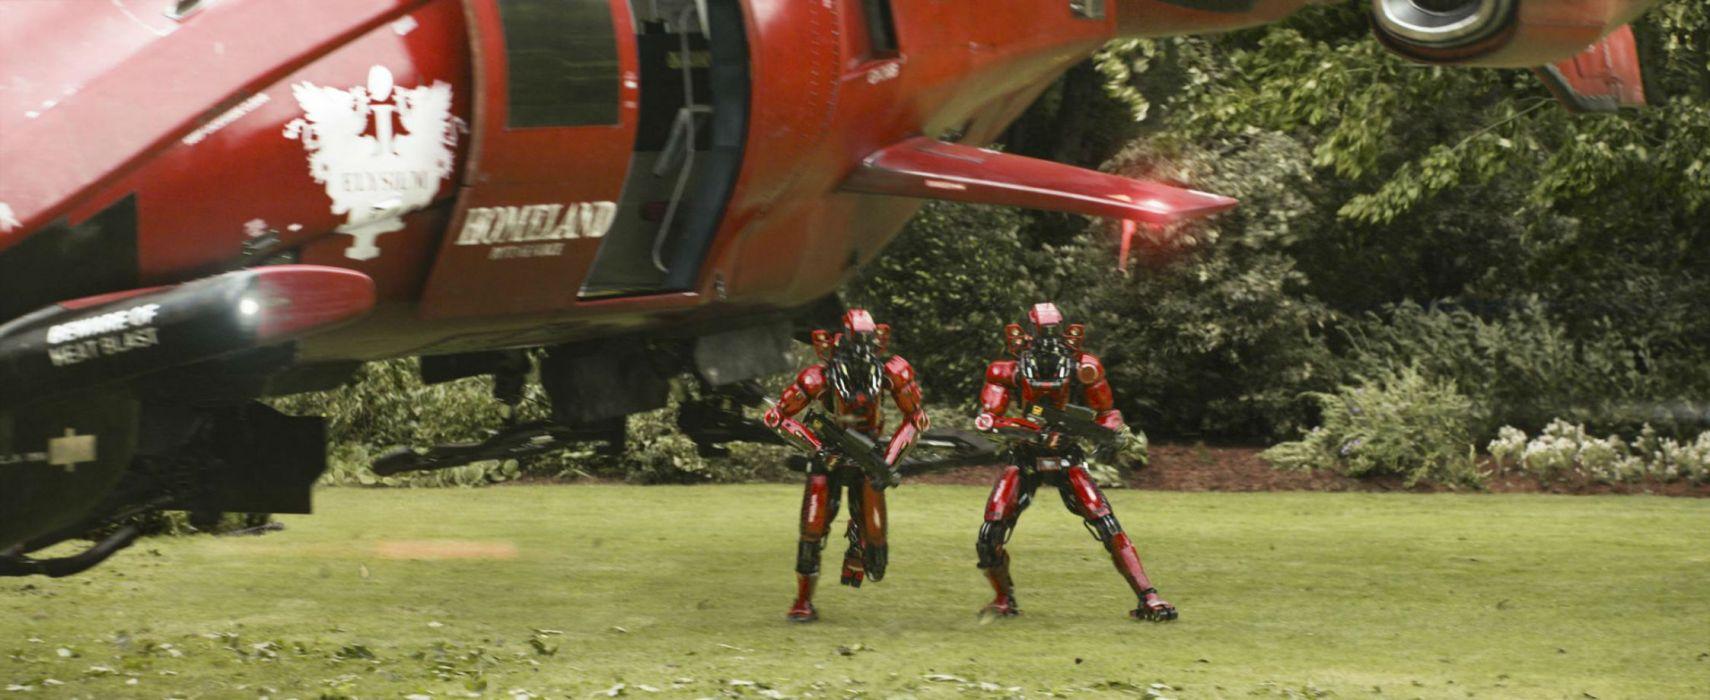 Elysium 2013 sci-fi futuristic apocalyptic future robot robots helicopter spaceship wallpaper